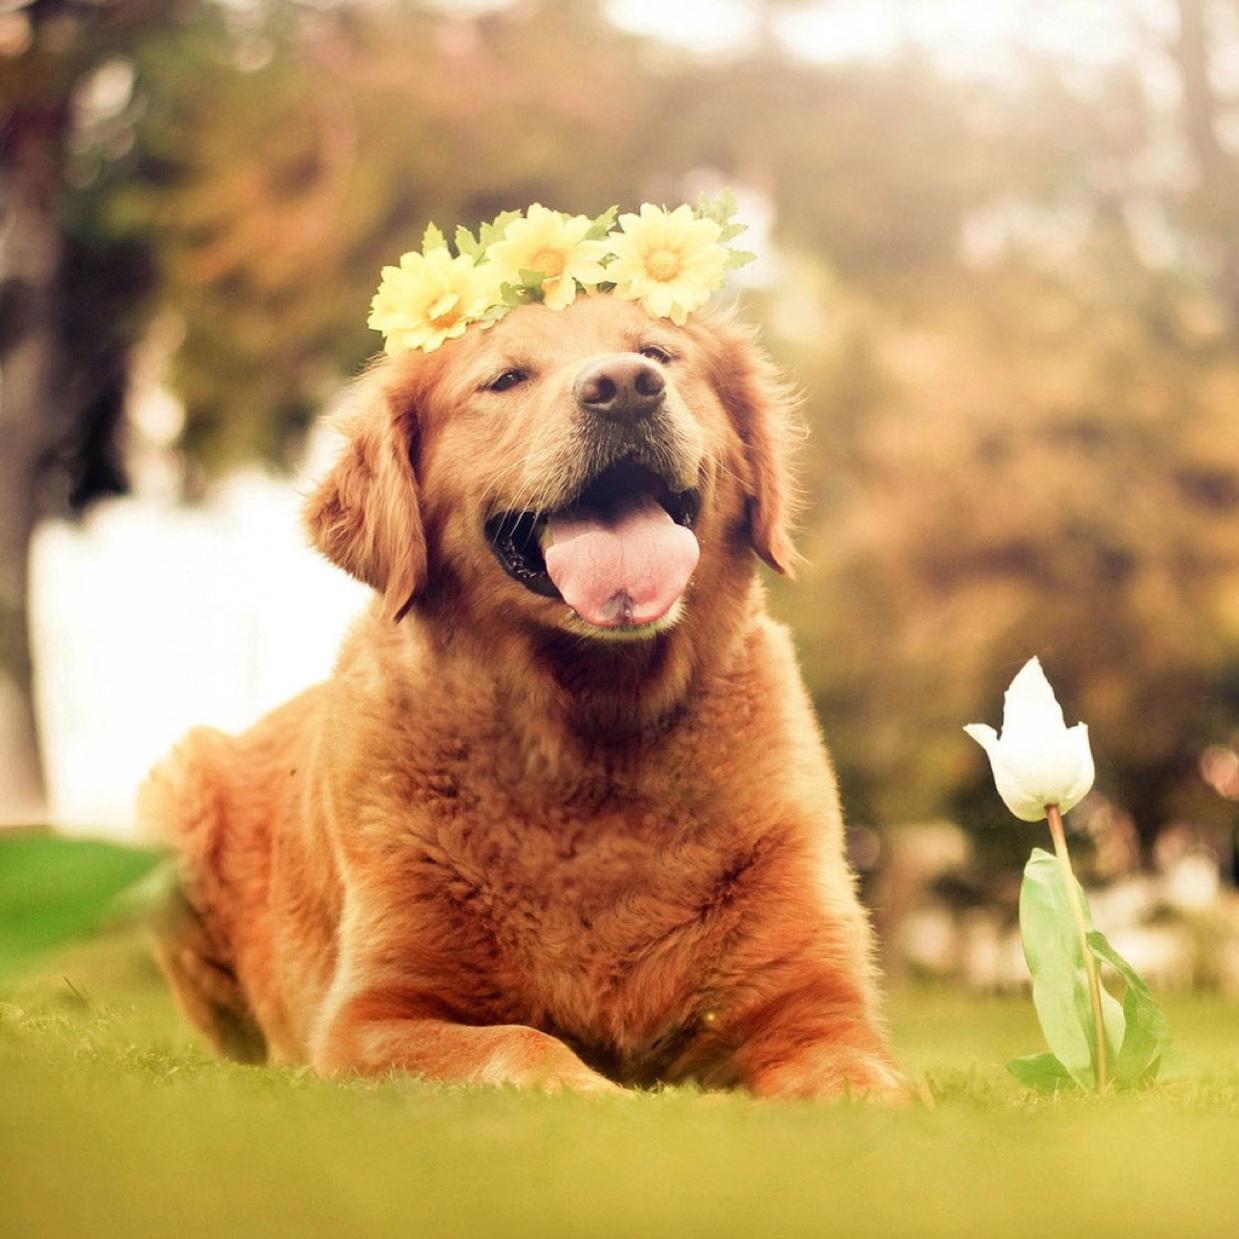 Owner M - Review for Pet Hosting in Australia